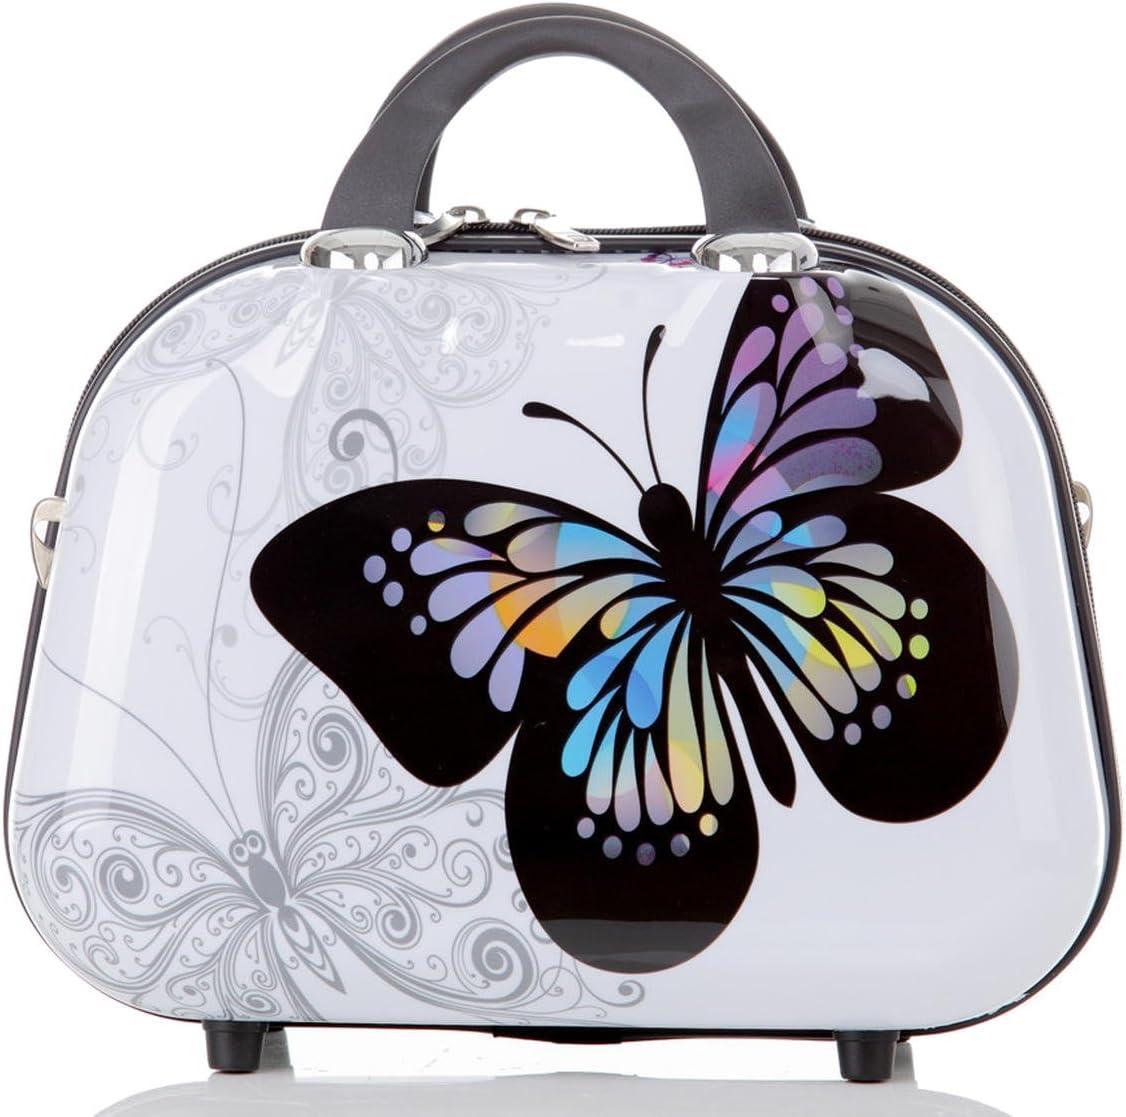 Maleta Neceser Viaje Cosmético Estuche Rígido Resistente Policarbonato ABS con motivo BB (Mariposa, Tamaño S (Neceser))